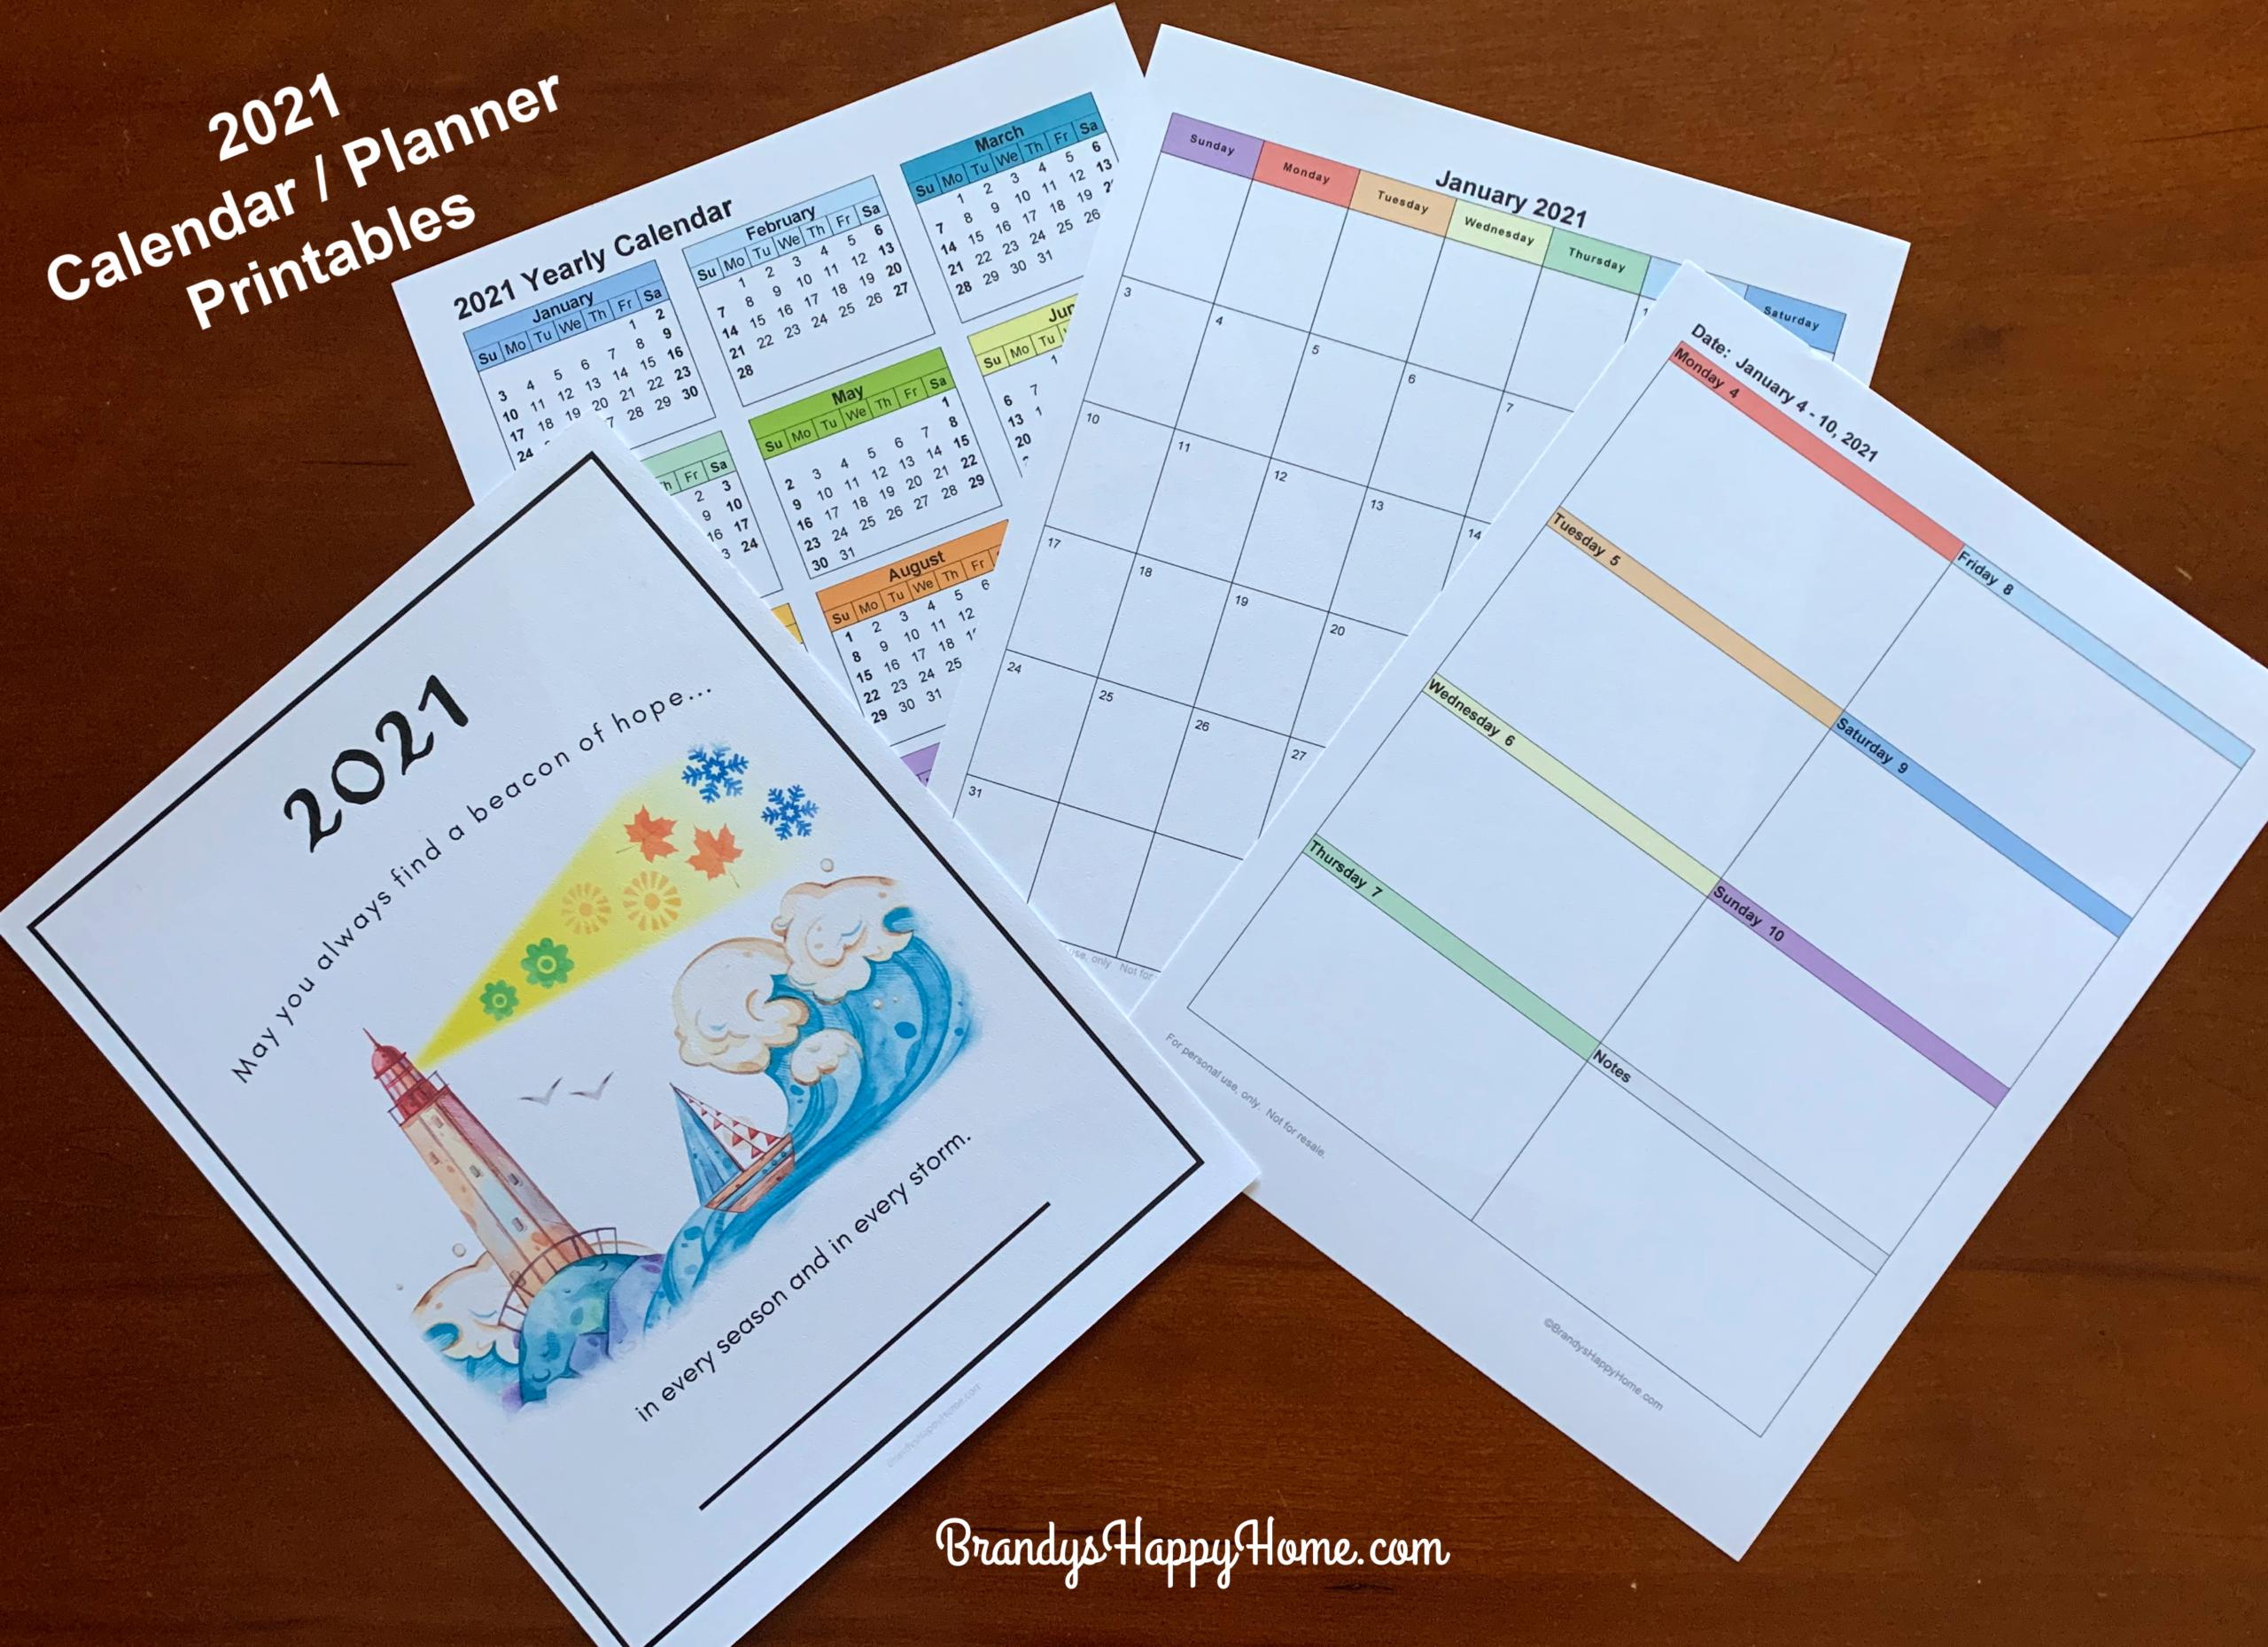 Free 2021 Calendar Planner Printables throughout 2021-2021 2 Year Pocket Planner: 2 Year